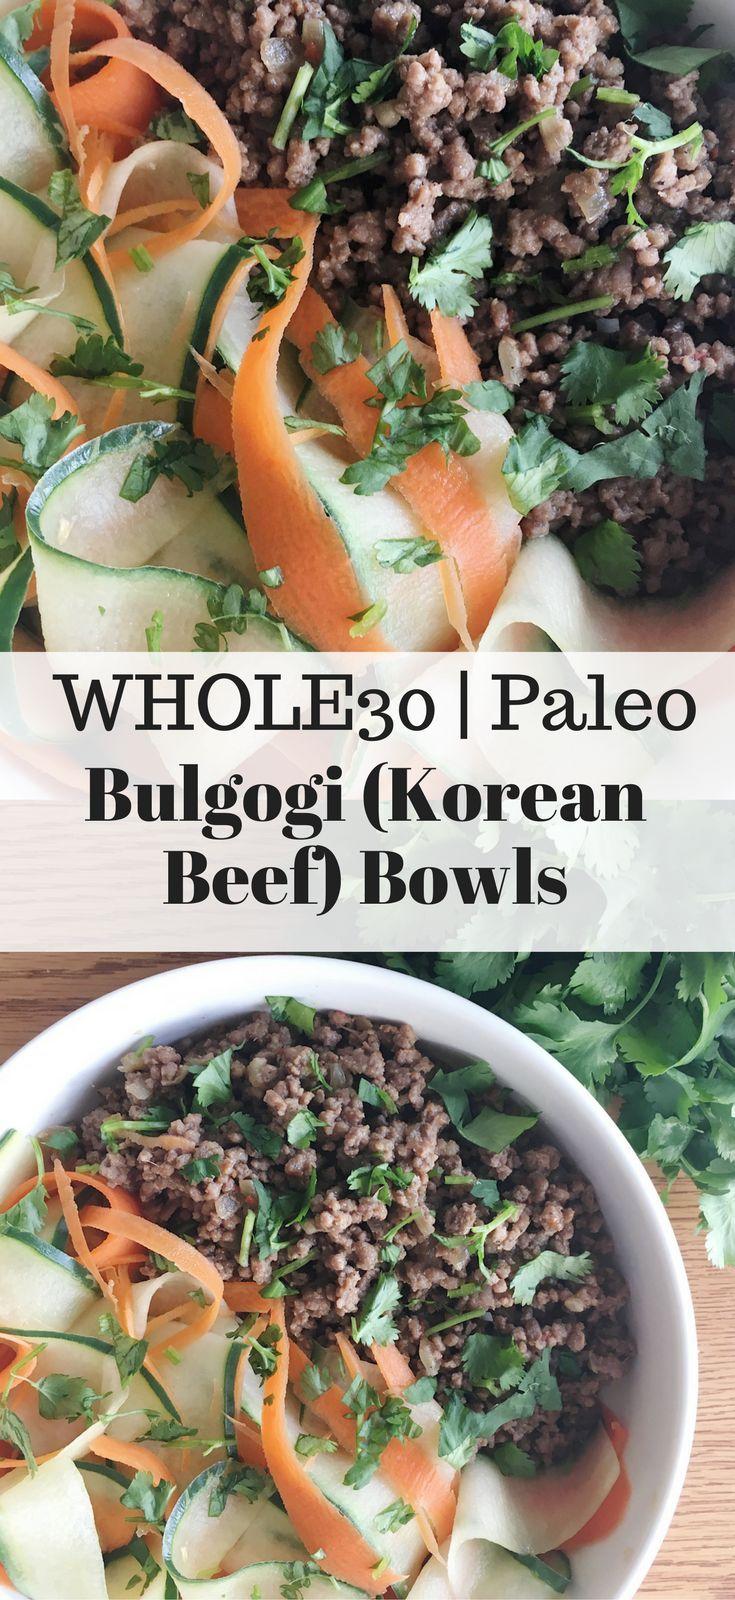 Bulgogi (Korean Beef) bowls - Whole30 & Paleo friendly!